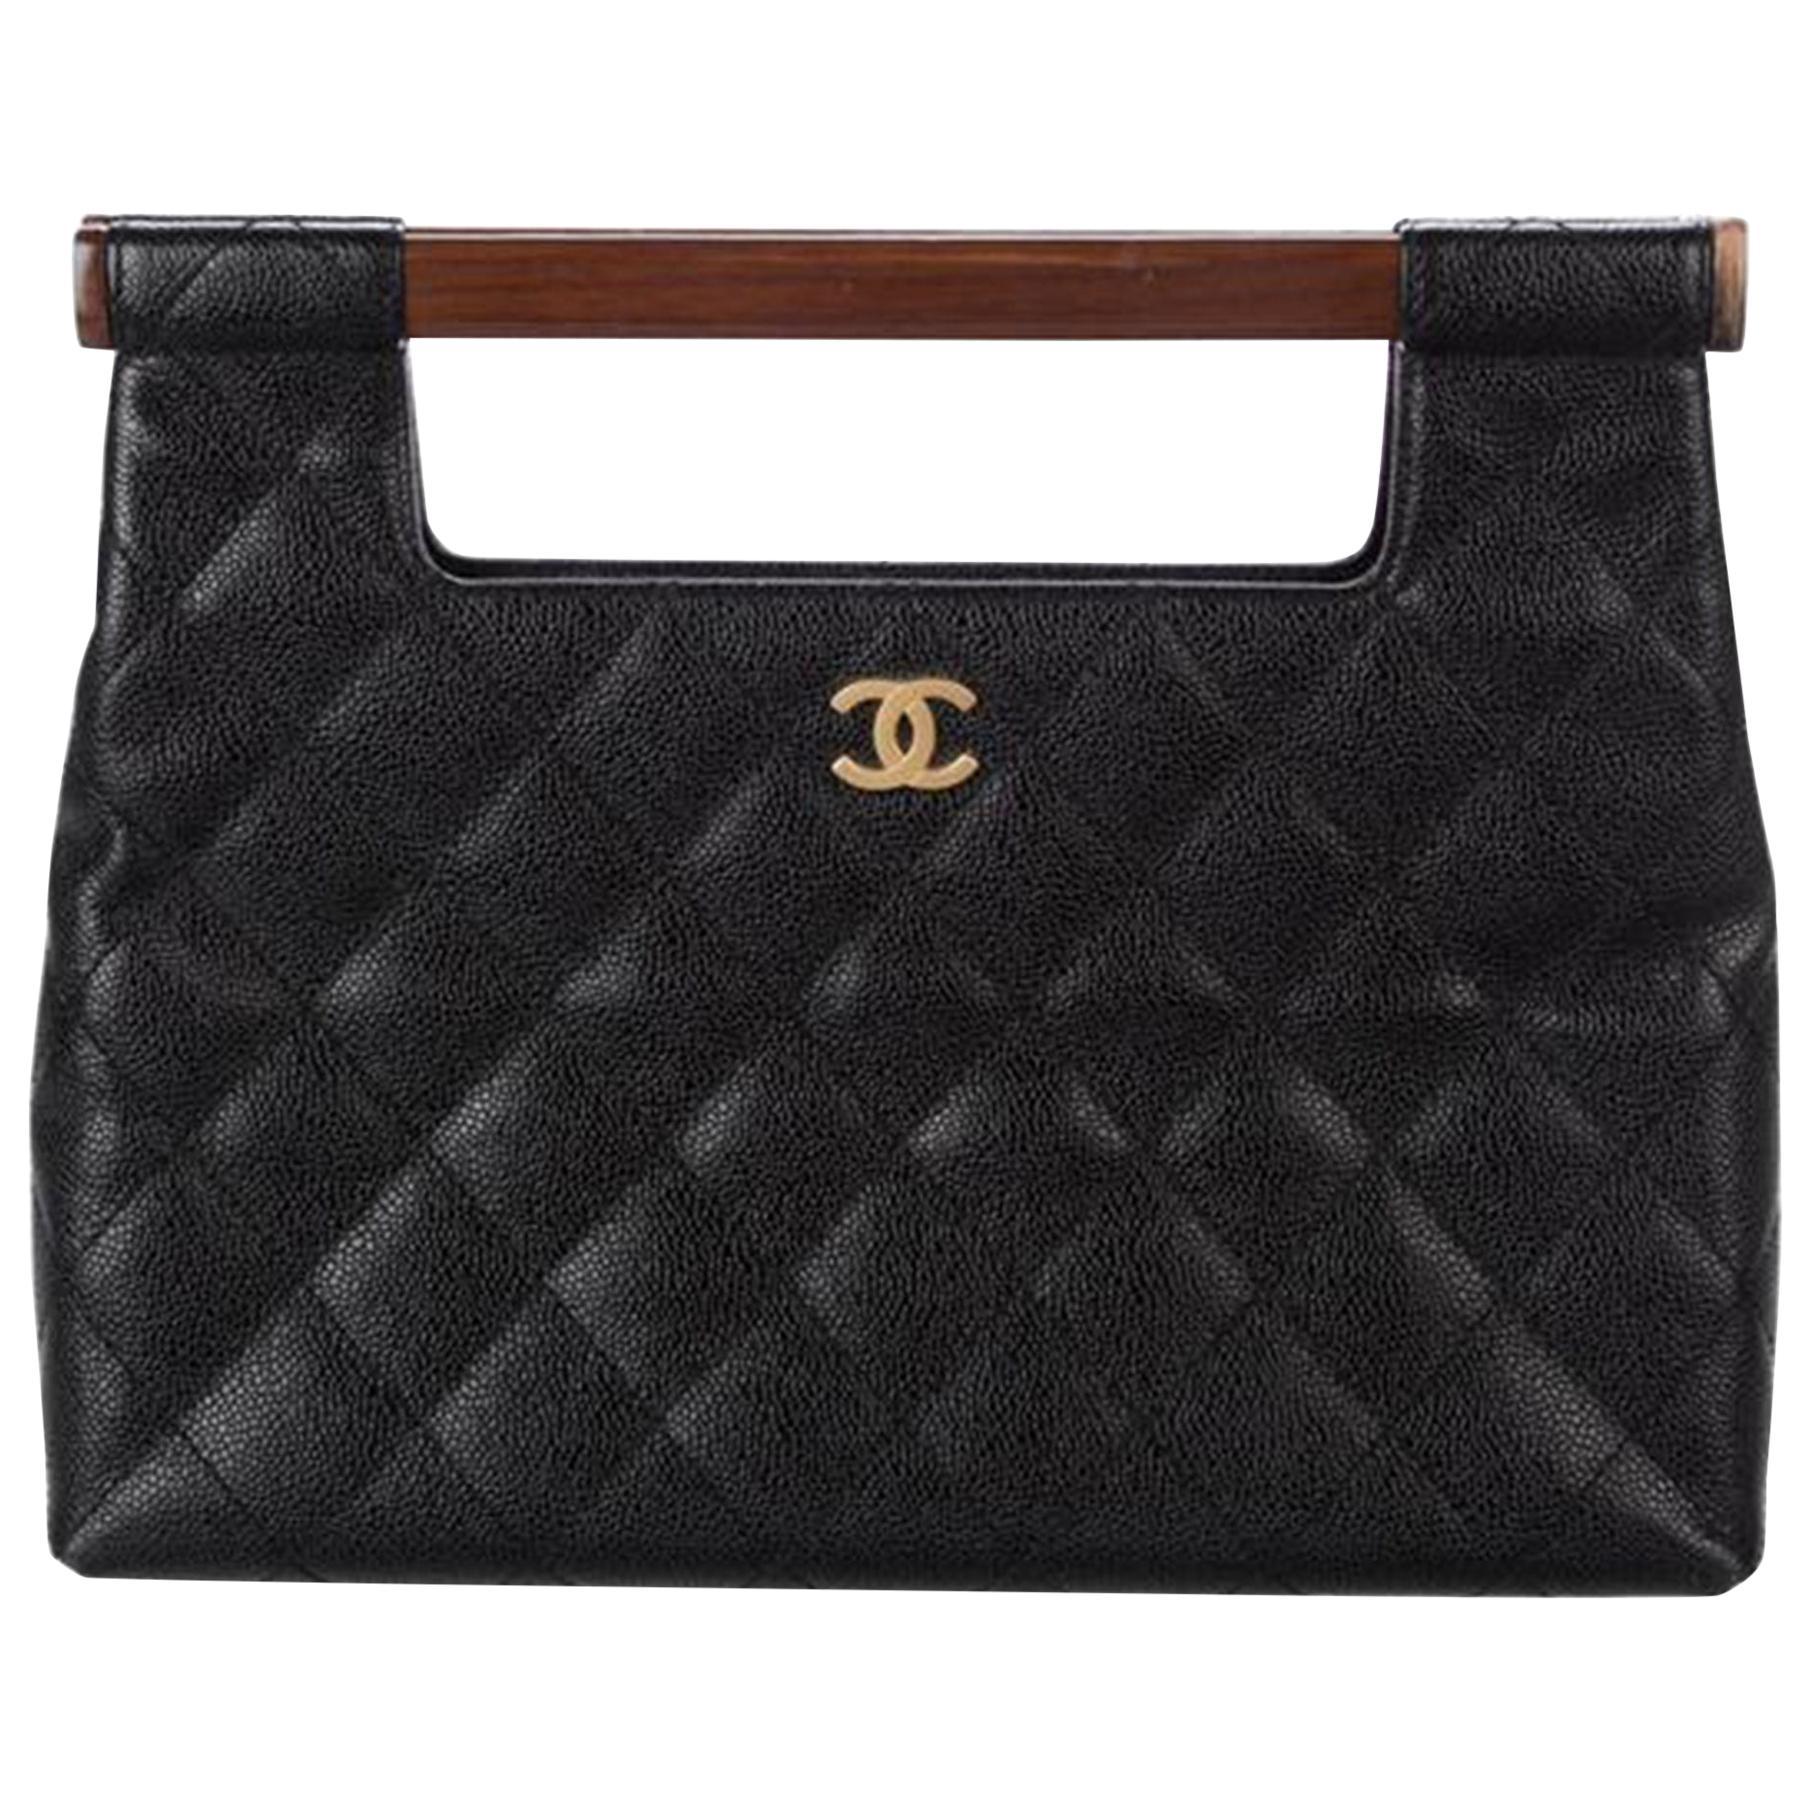 Chanel Wood Top Handle Rare Vintage Black Caviar Leather Clutch